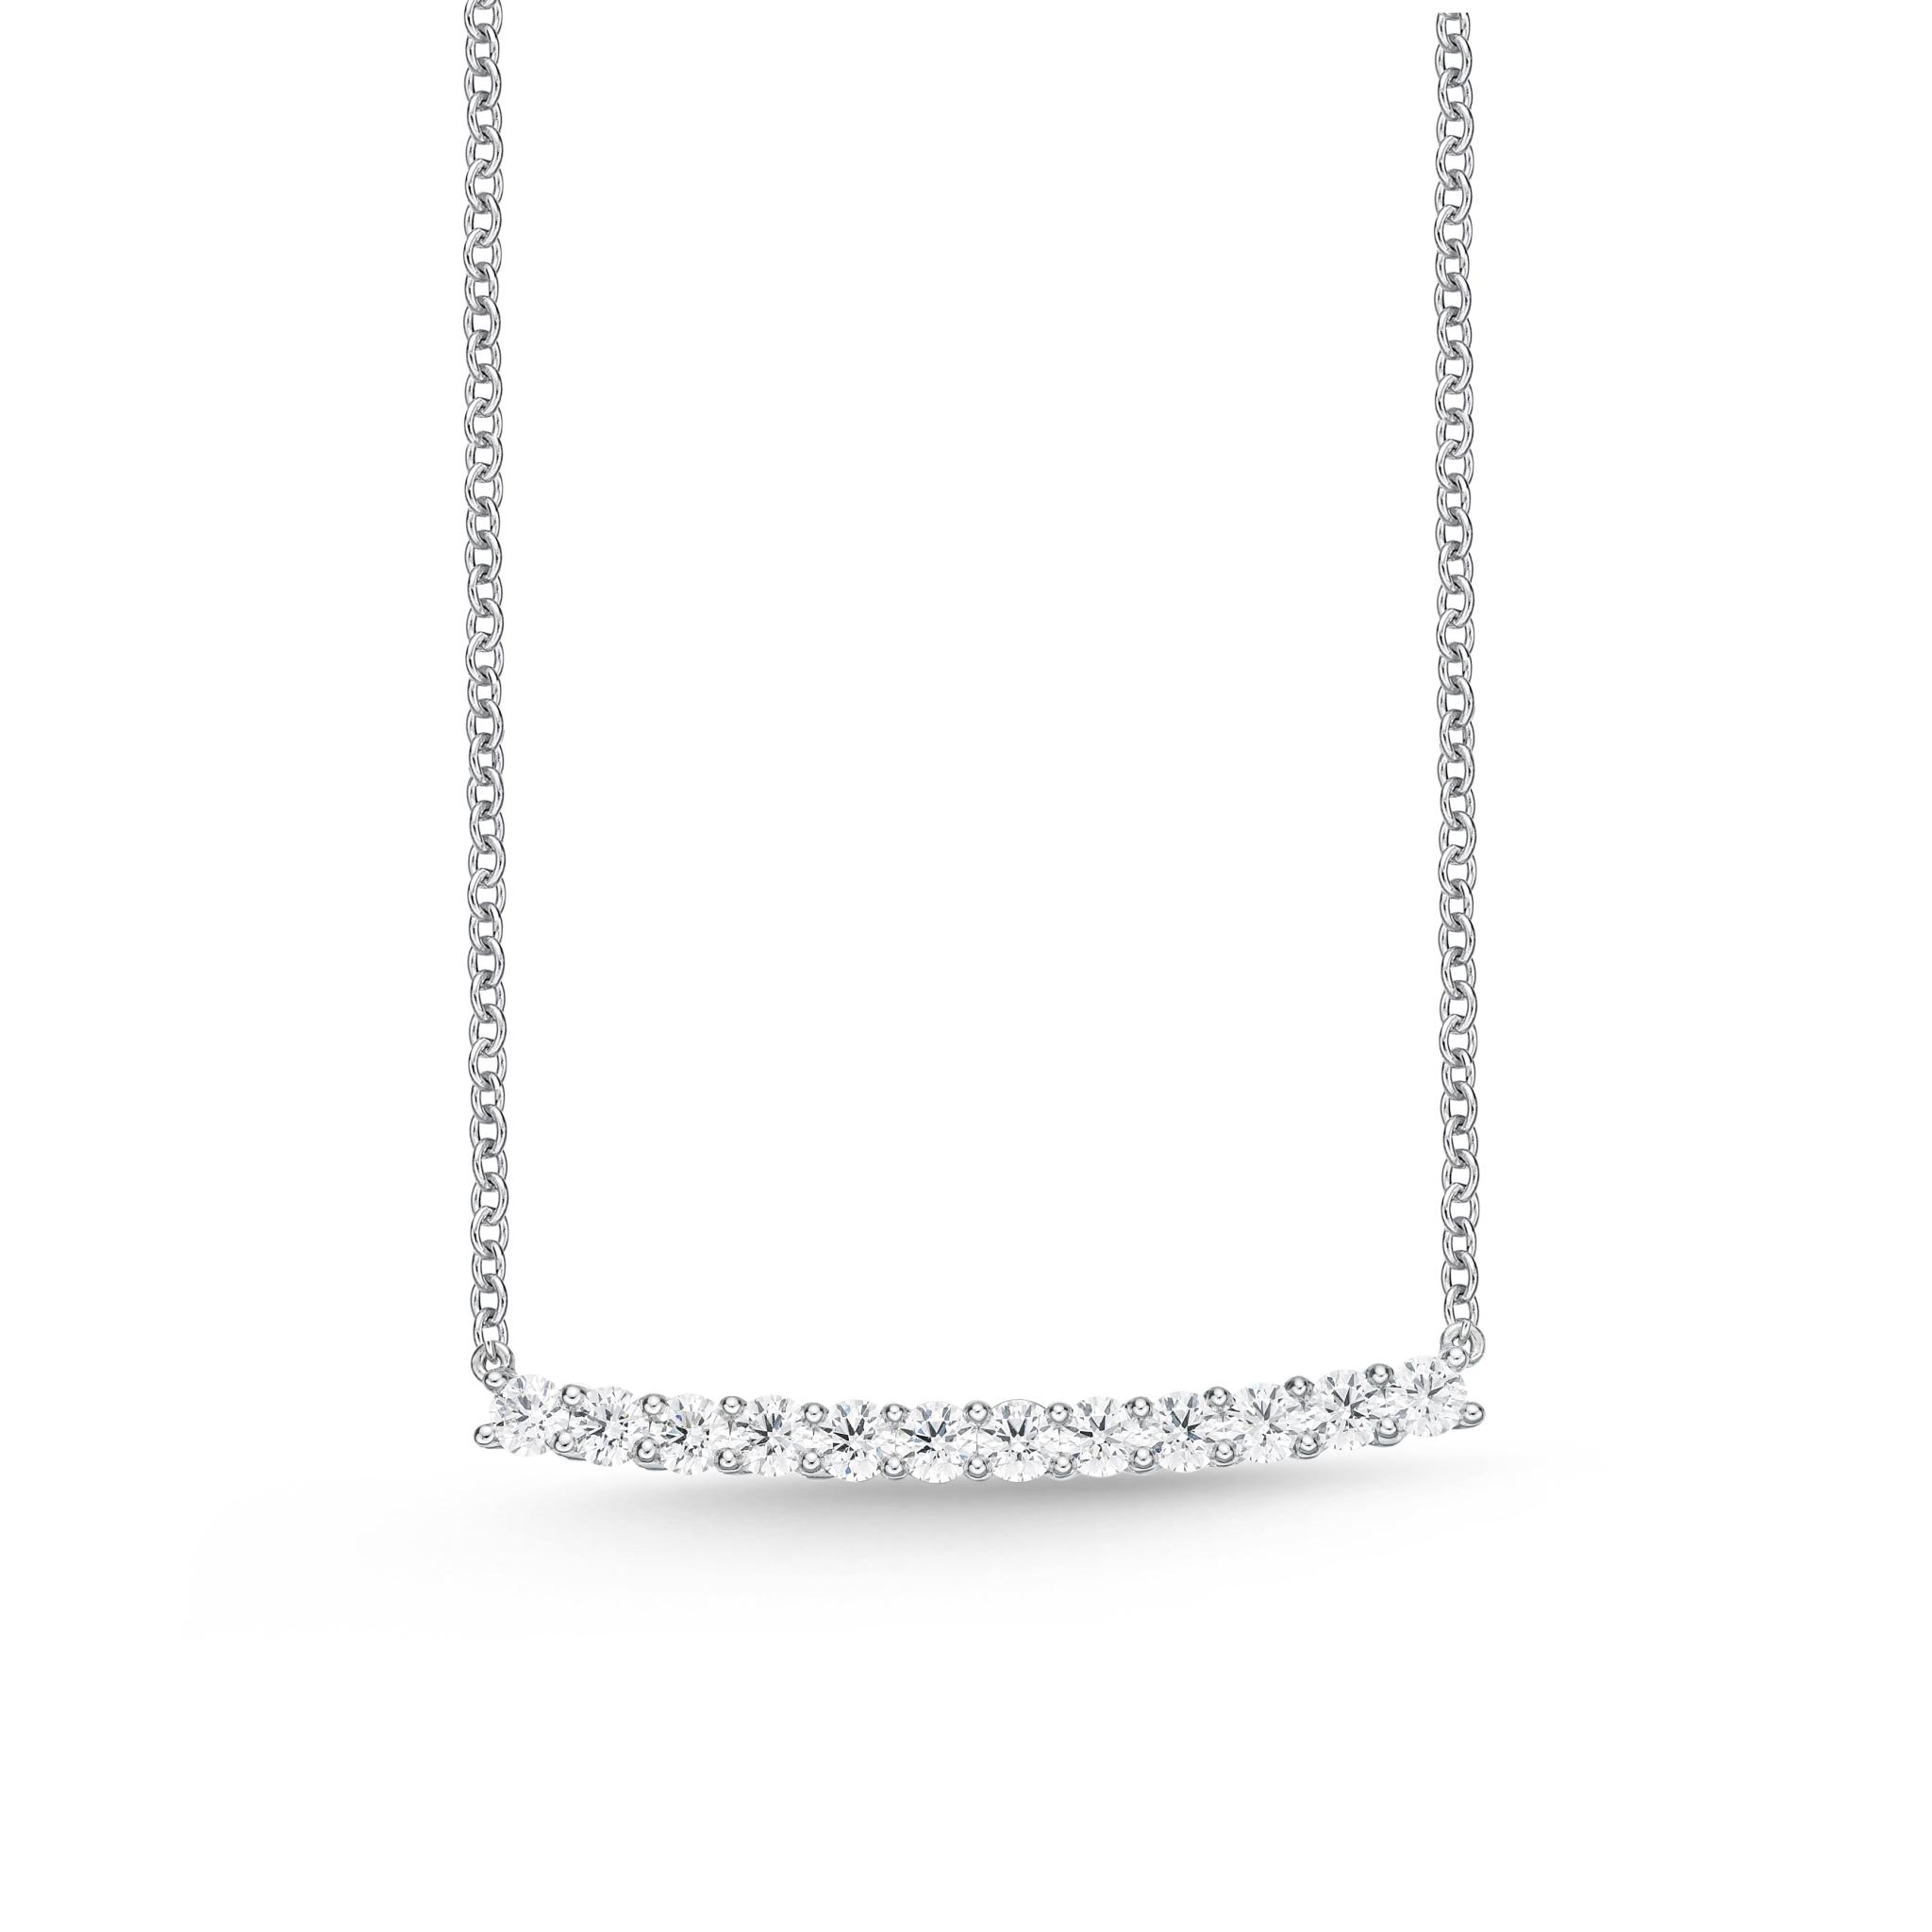 Memoire 18ct White Gold 1 Carat Diamond Horizontal Bar Necklace 45cm